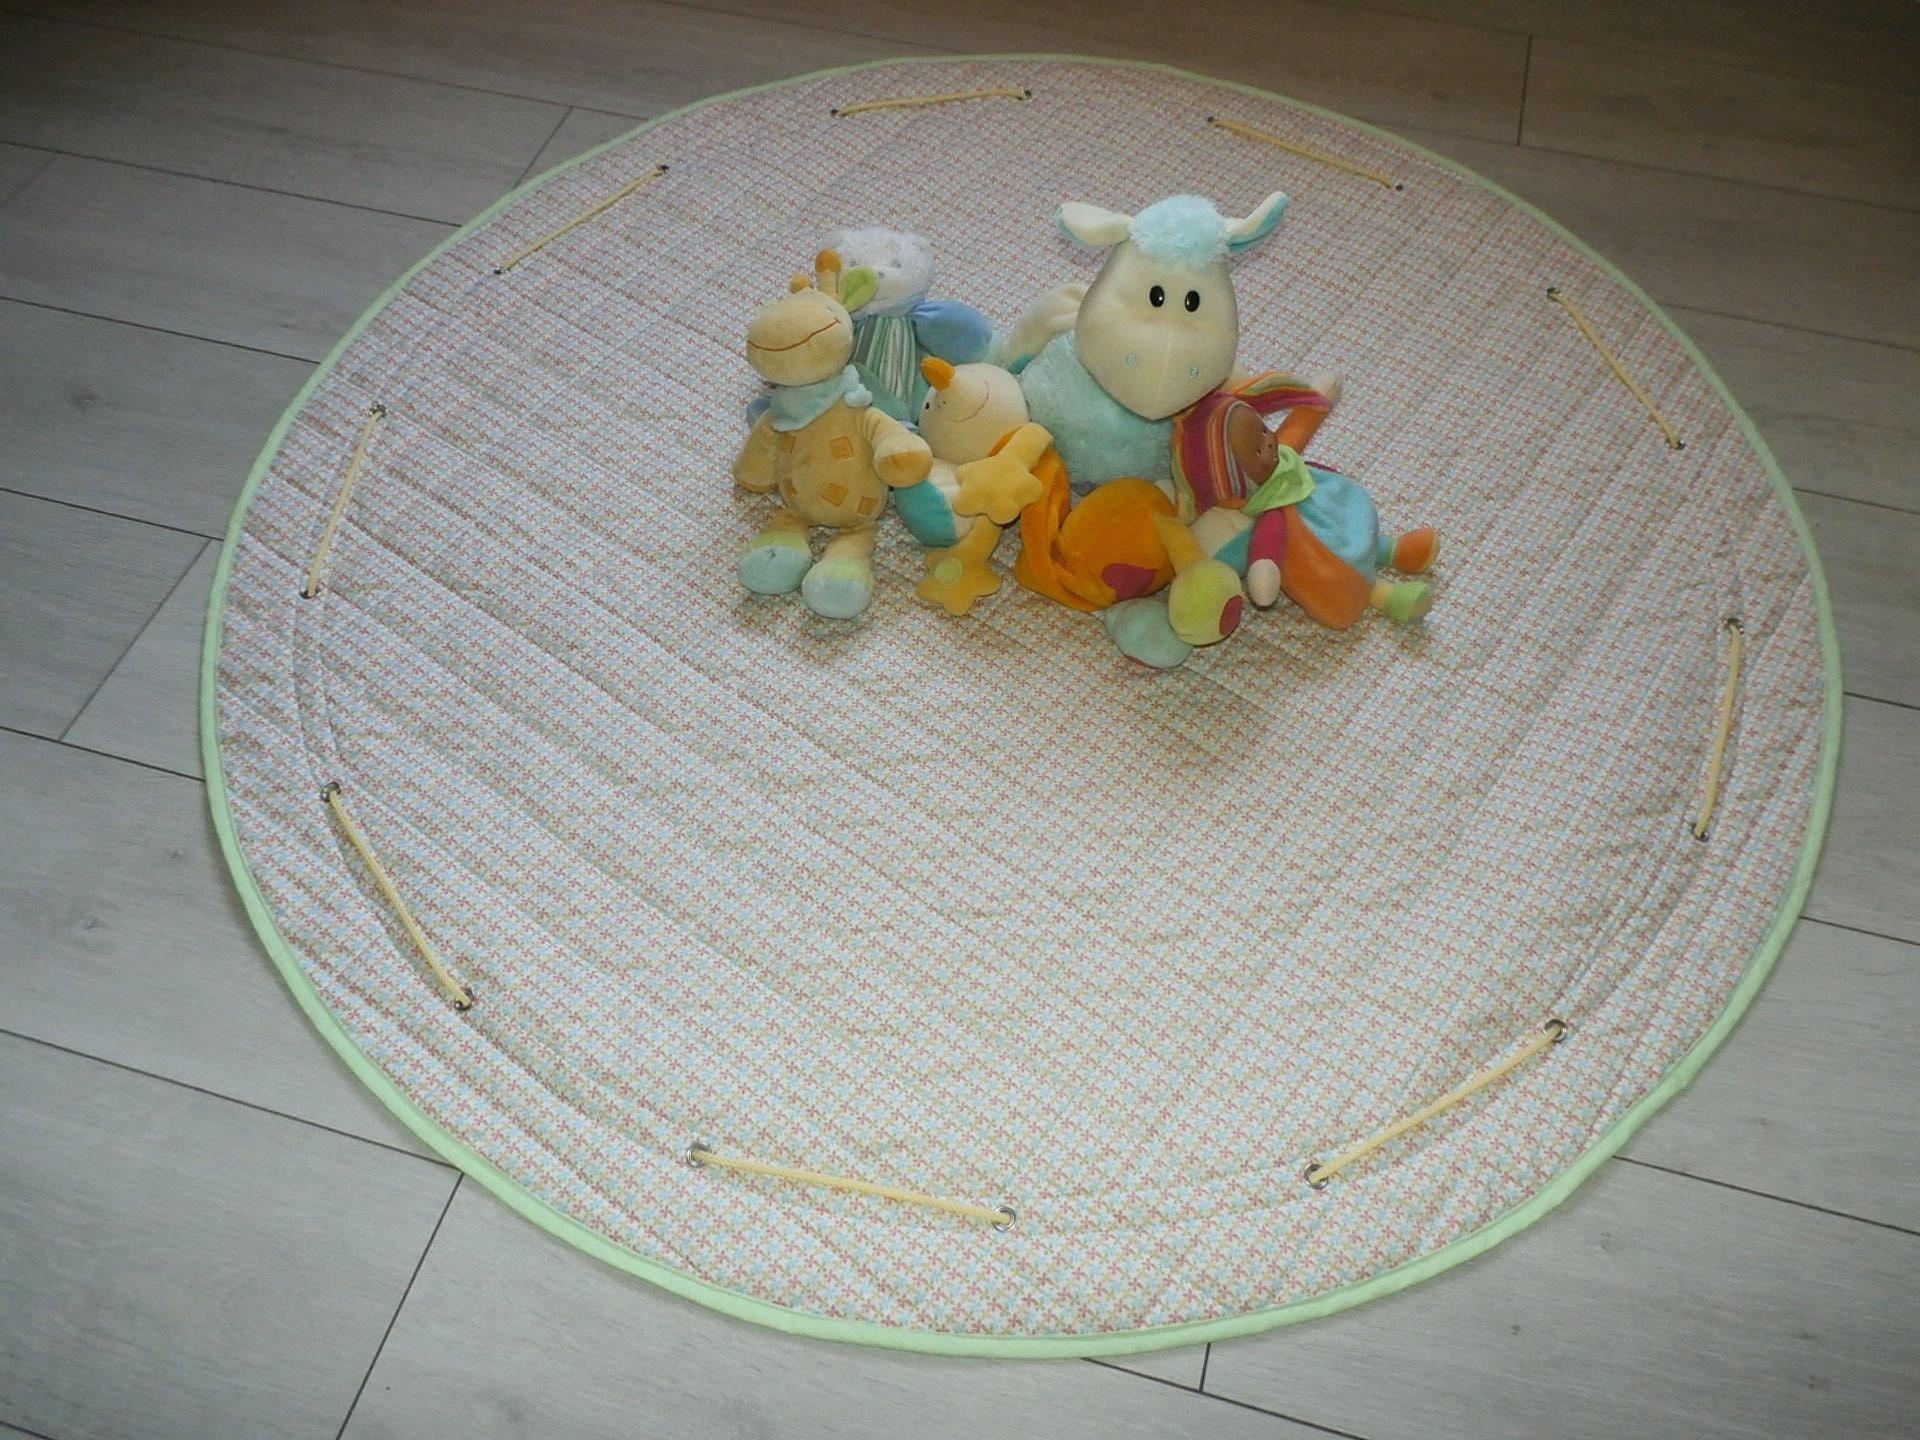 sac jouets tapis de jeu en tissu matelass. Black Bedroom Furniture Sets. Home Design Ideas